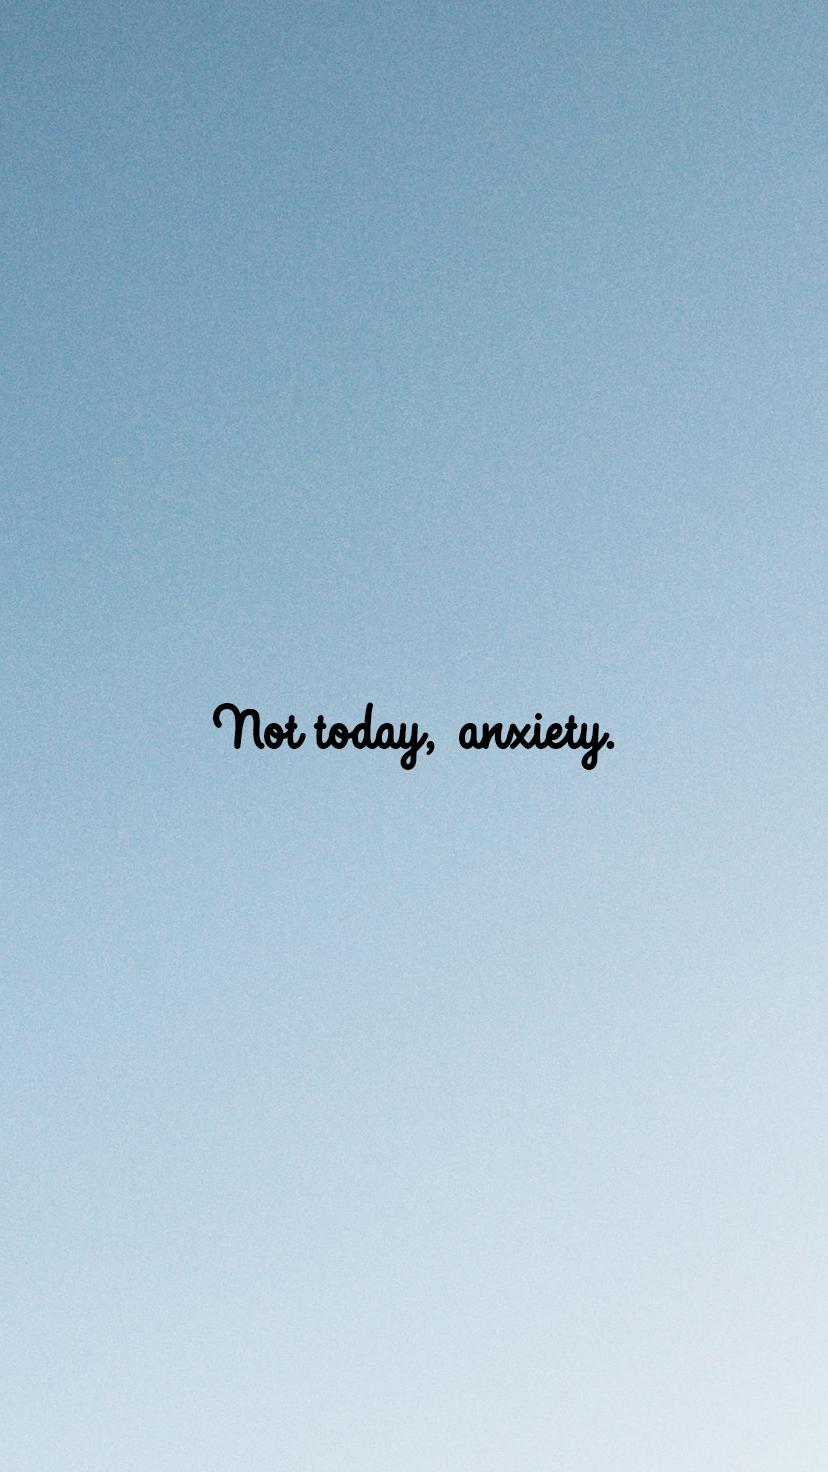 Not-Today-Anxiety-Iphone_c20a9c3c-7925-4645-a685-ab02f3efb8c8.png